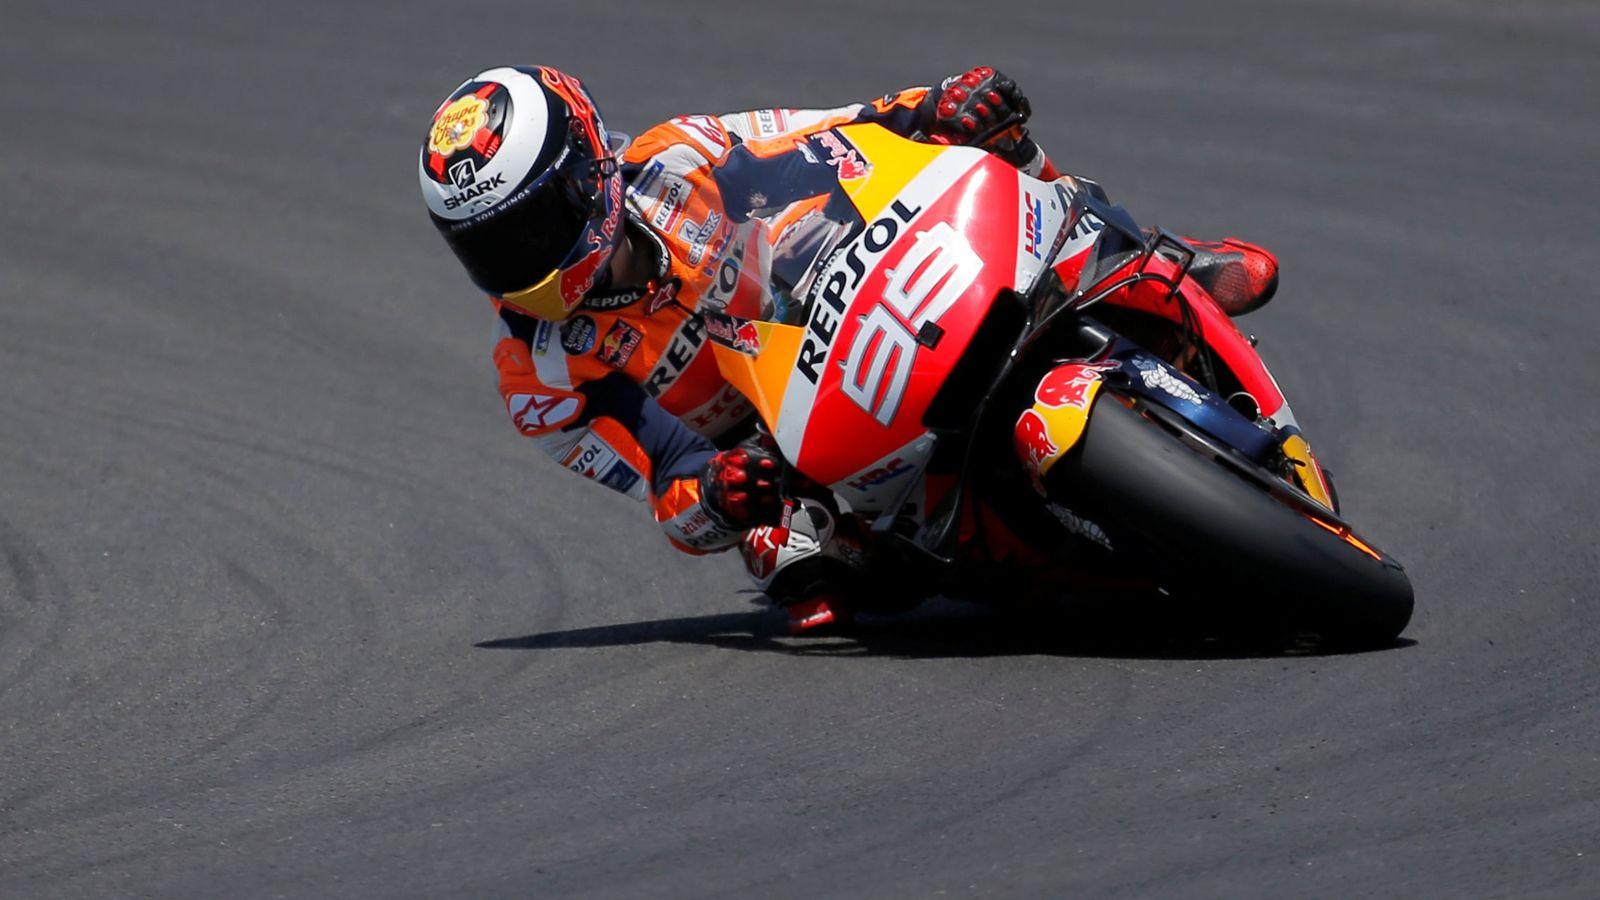 Foto: Jorge Lorenzo, durante el Gran Premio de Jerez. (Reuters)